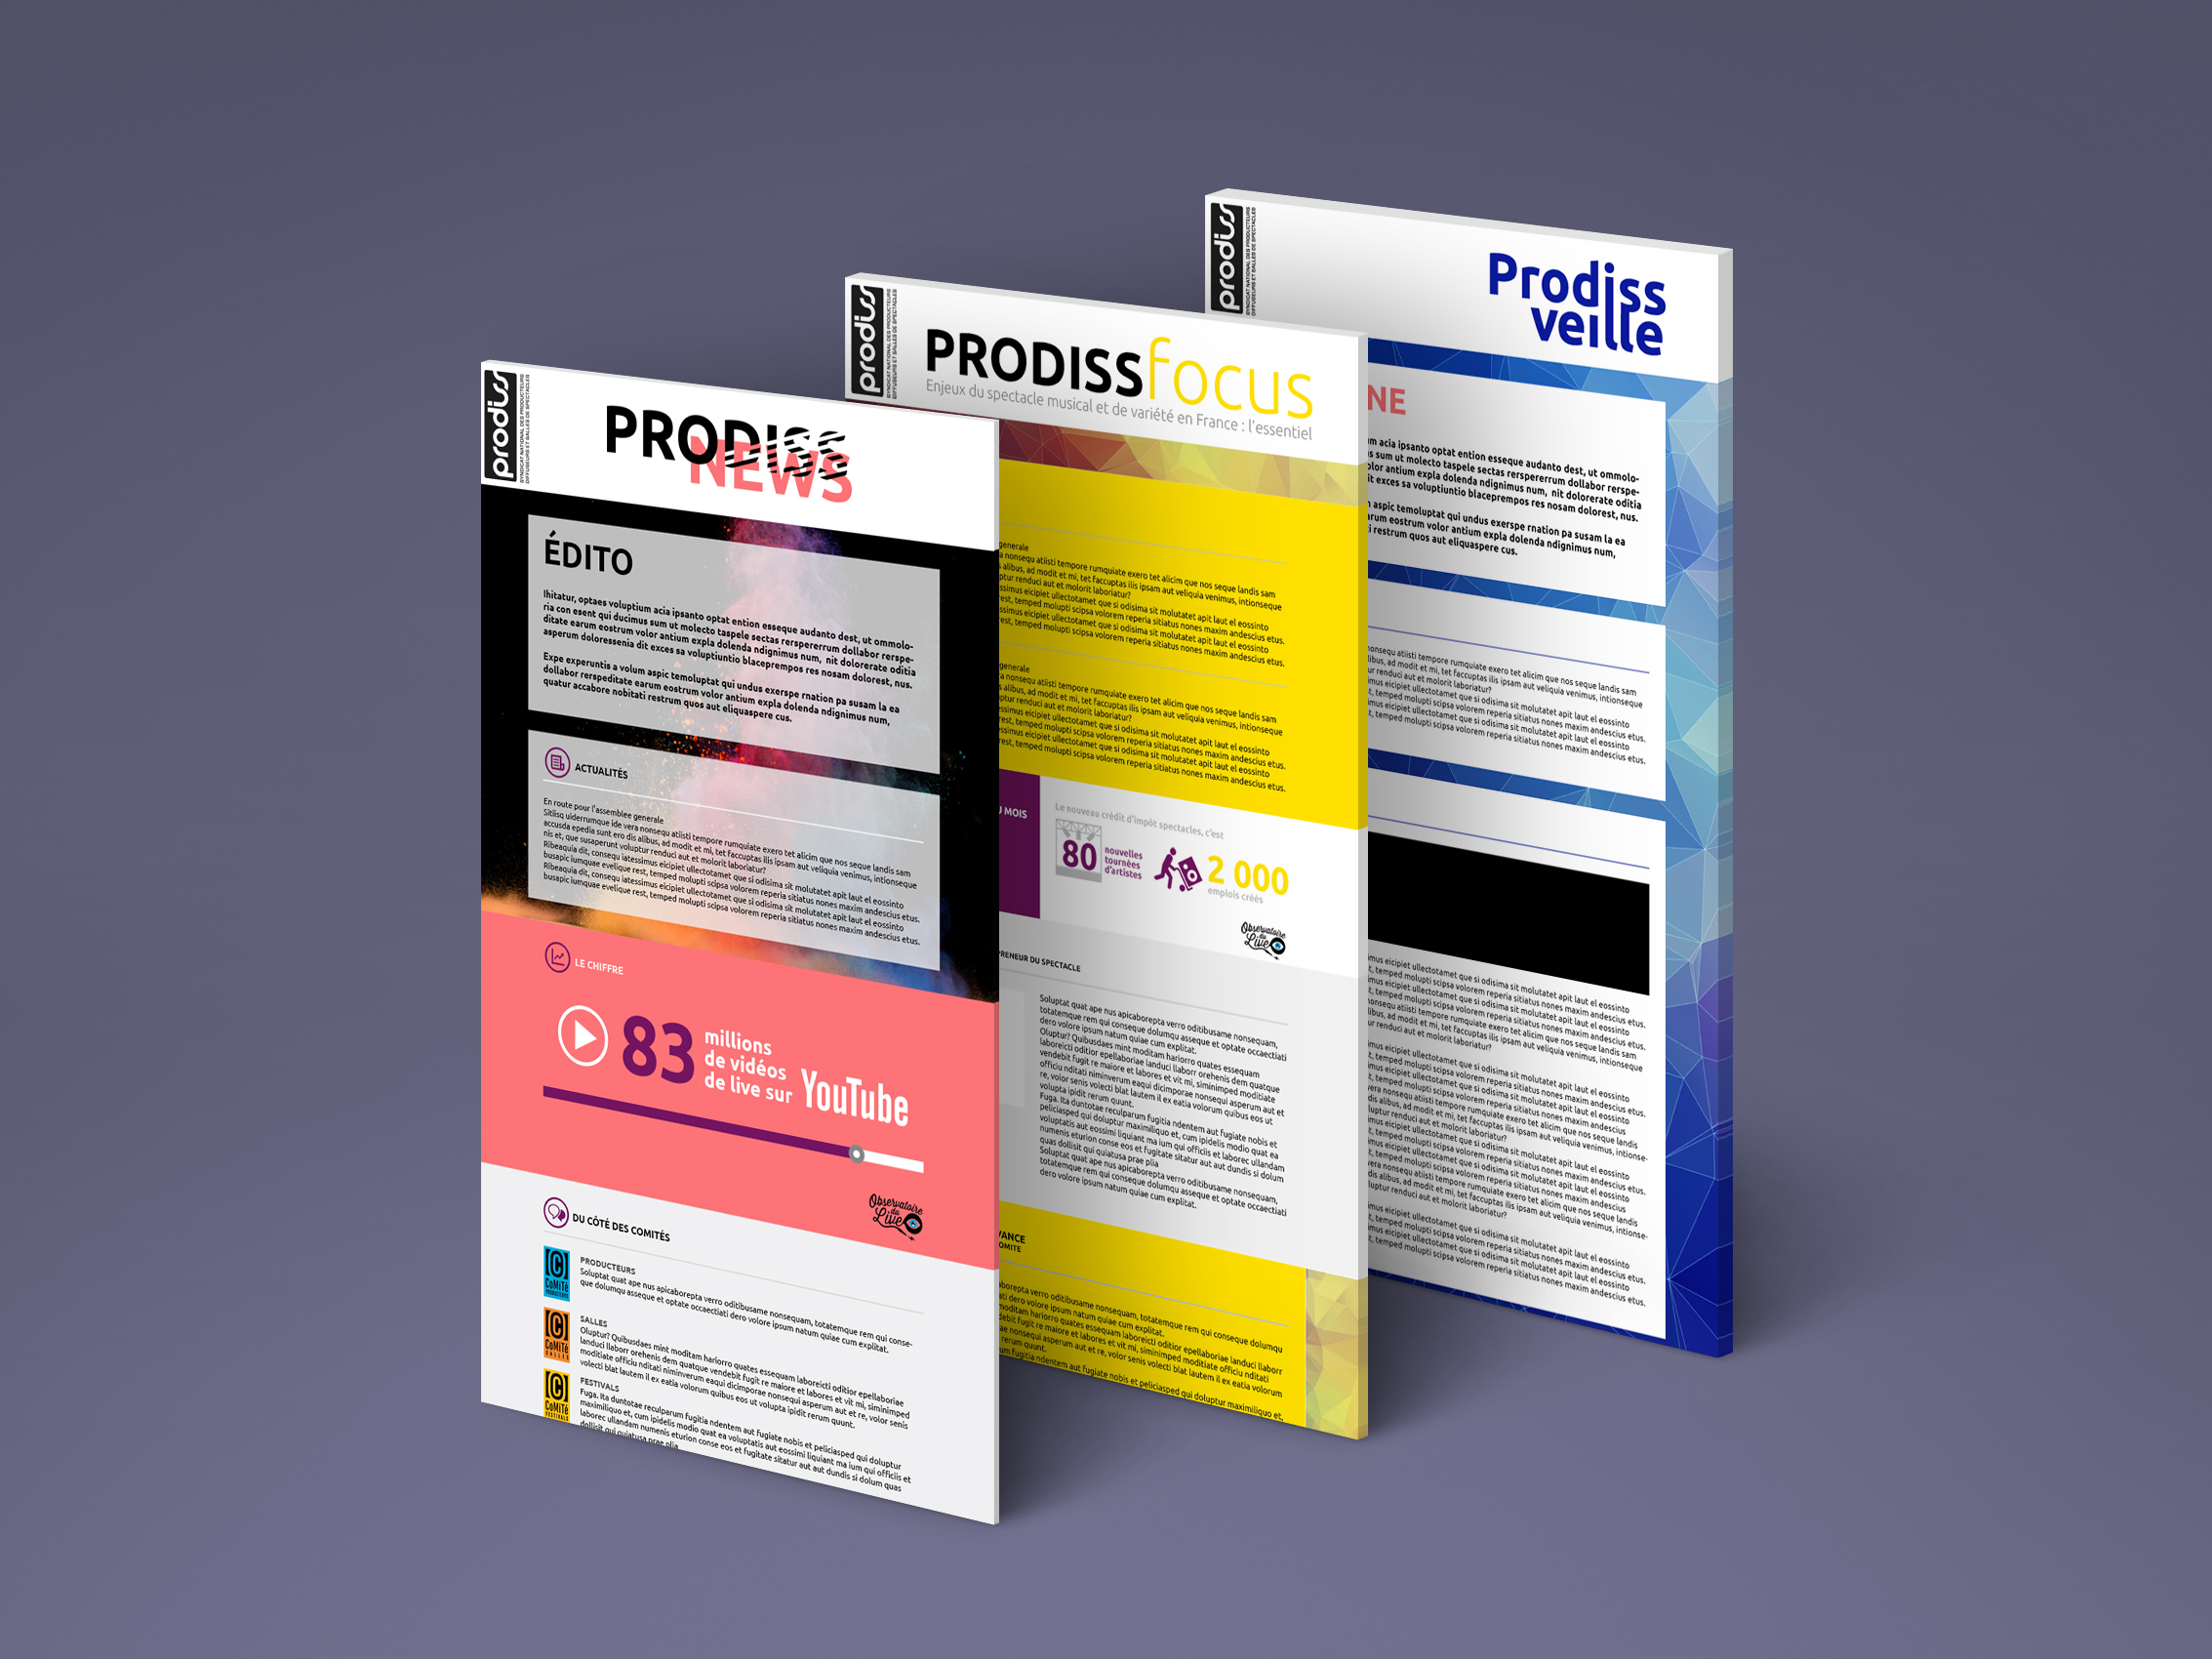 prodiss-newsletters